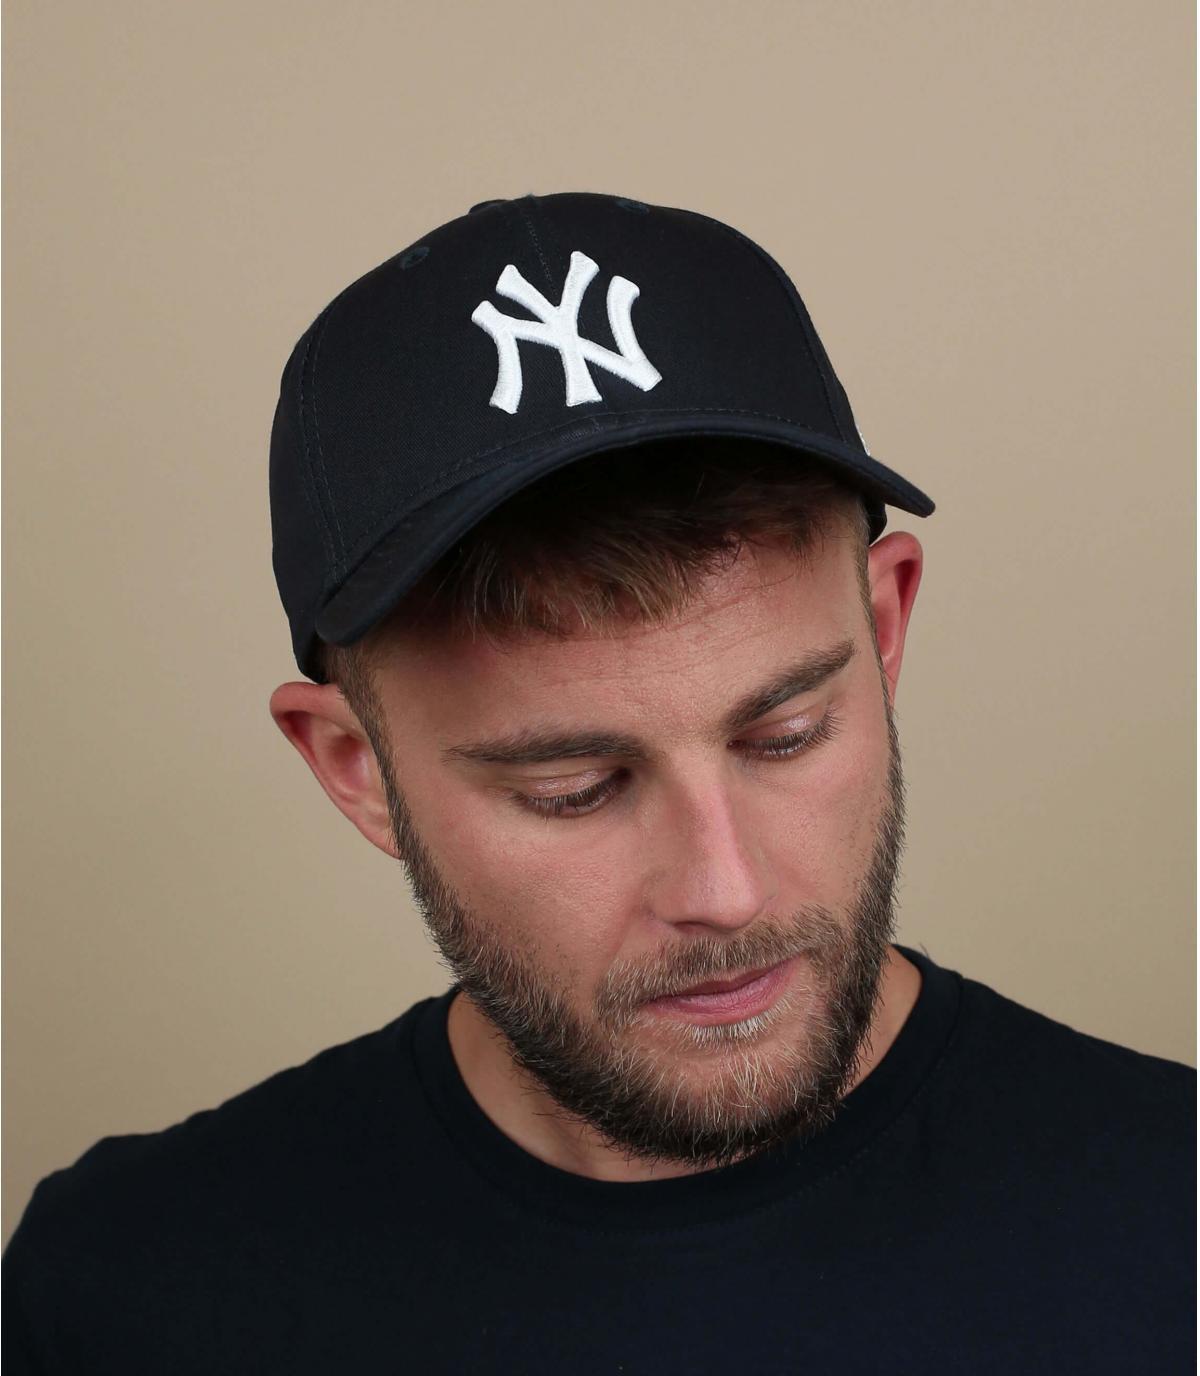 Adjustable black cap